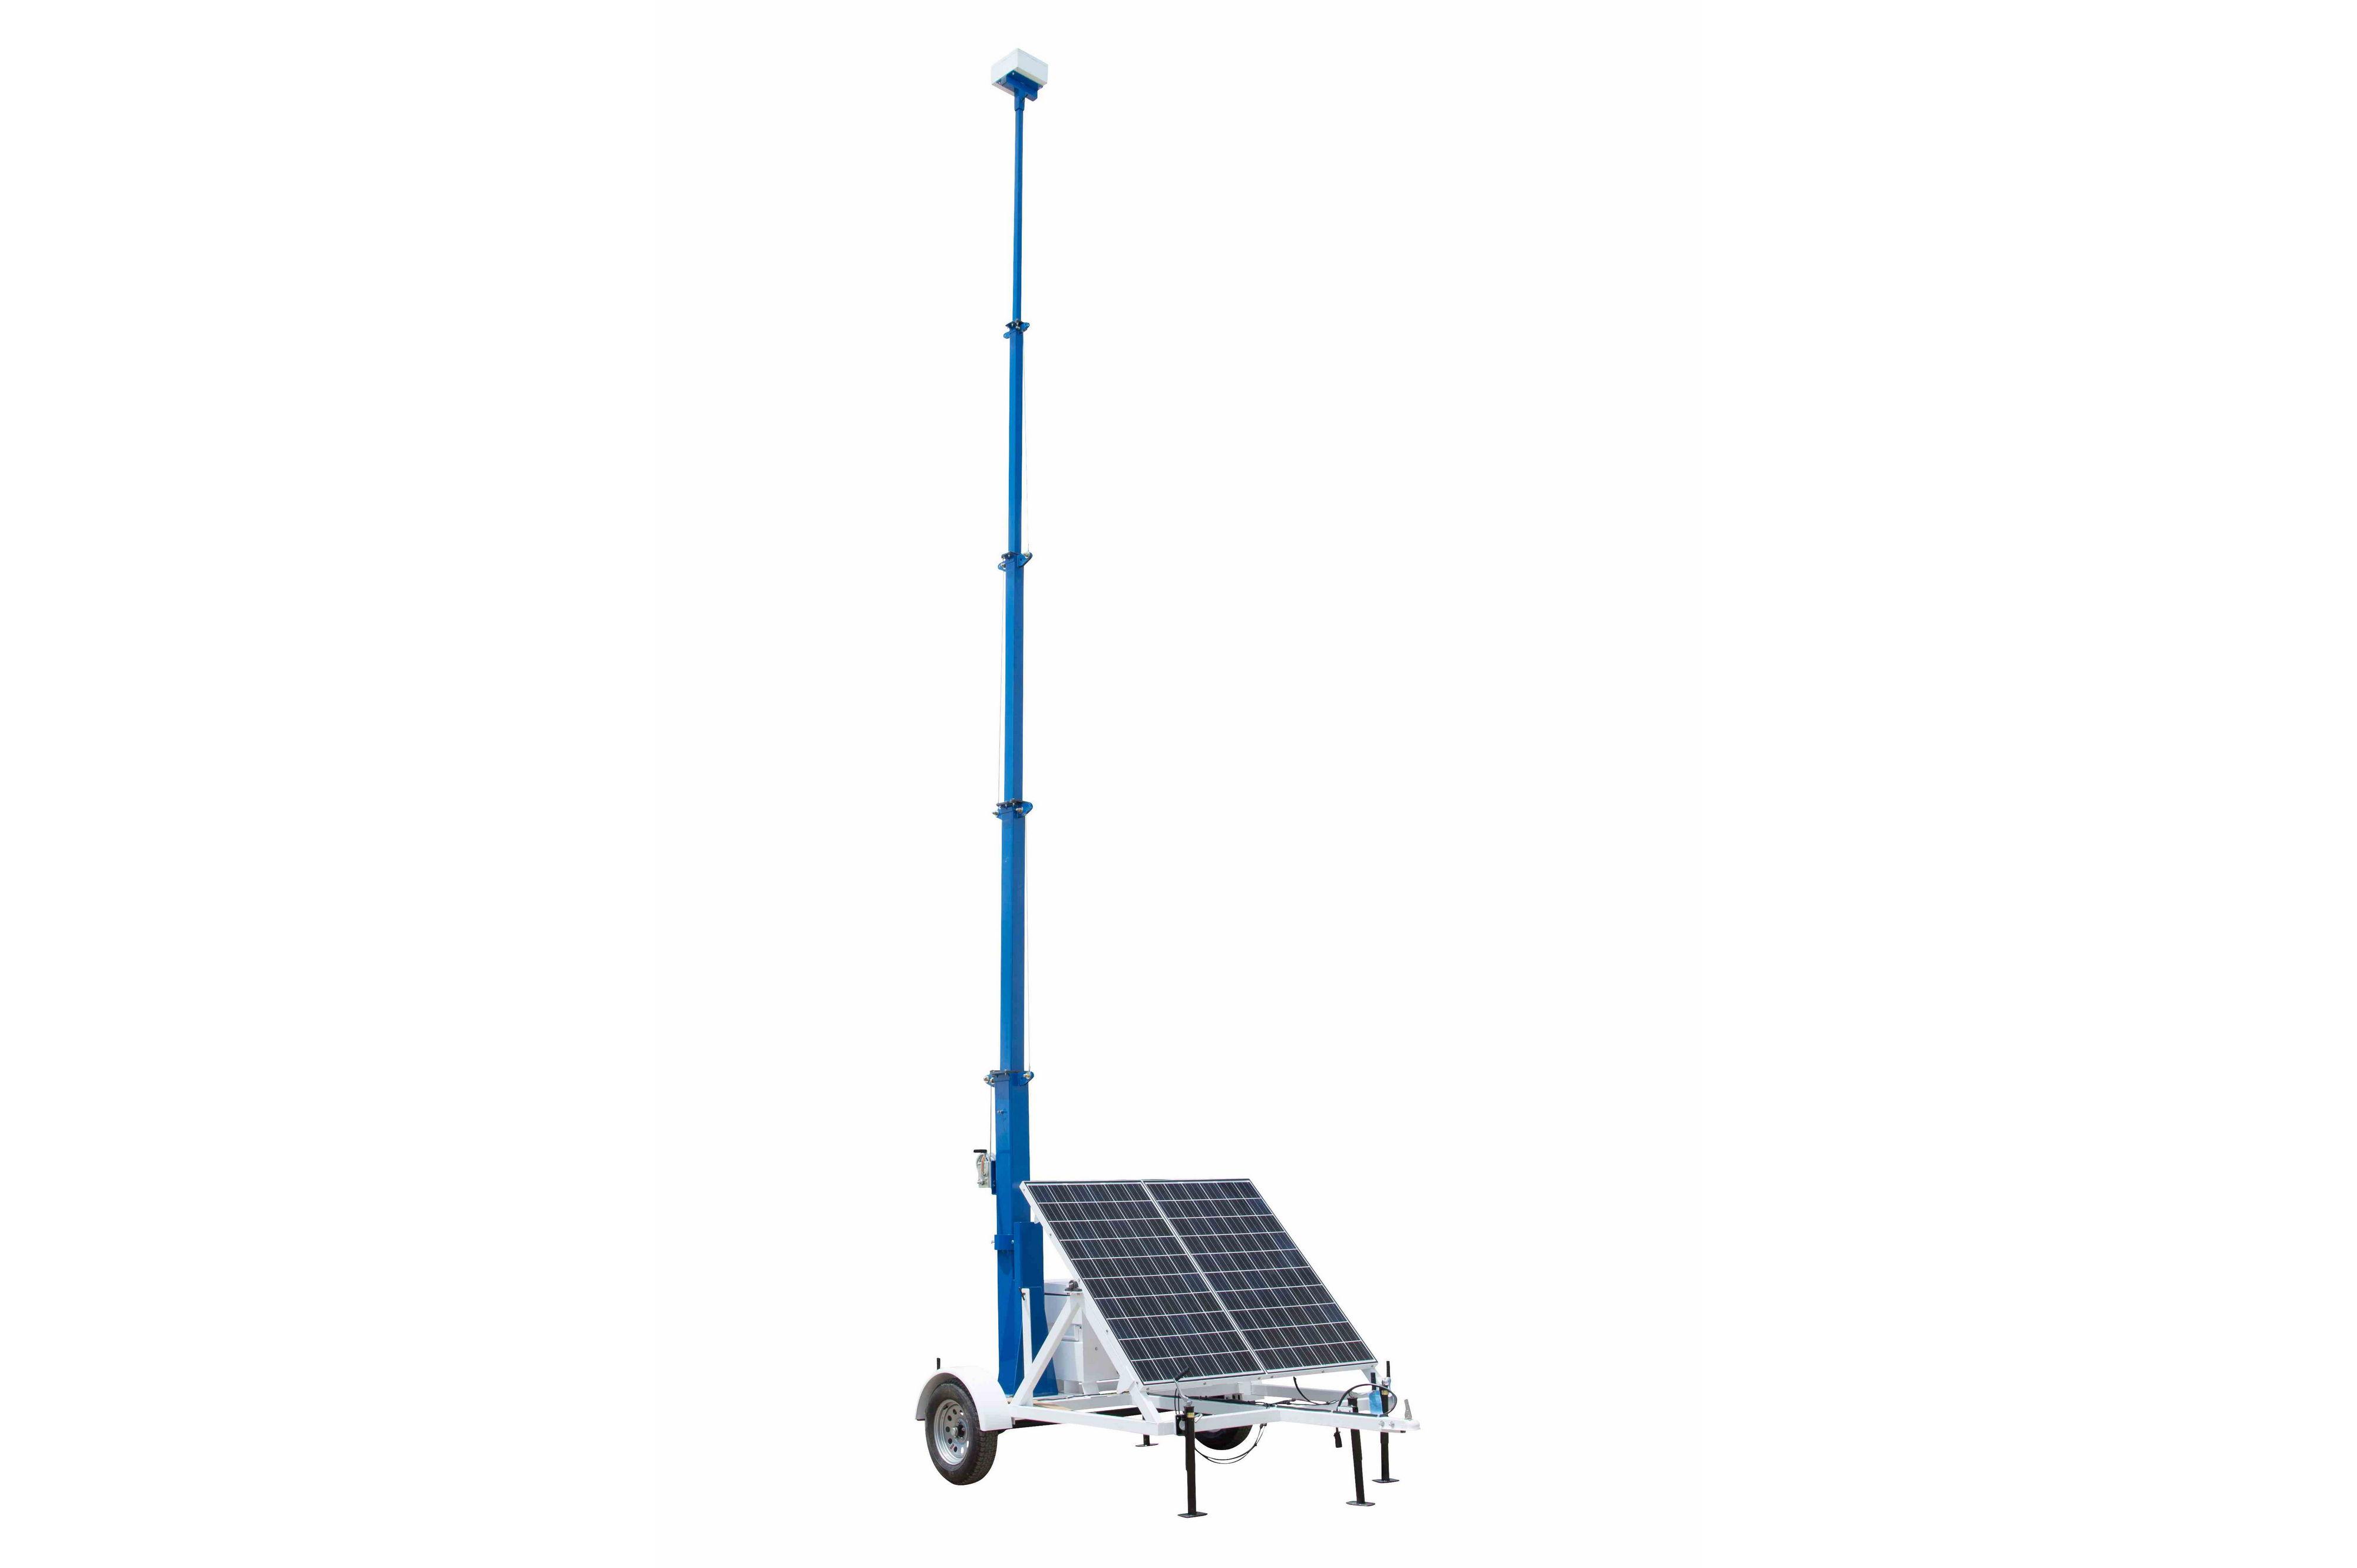 145937 Top Result 50 Inspirational Portable solar Panels Image 2018 Hdj5